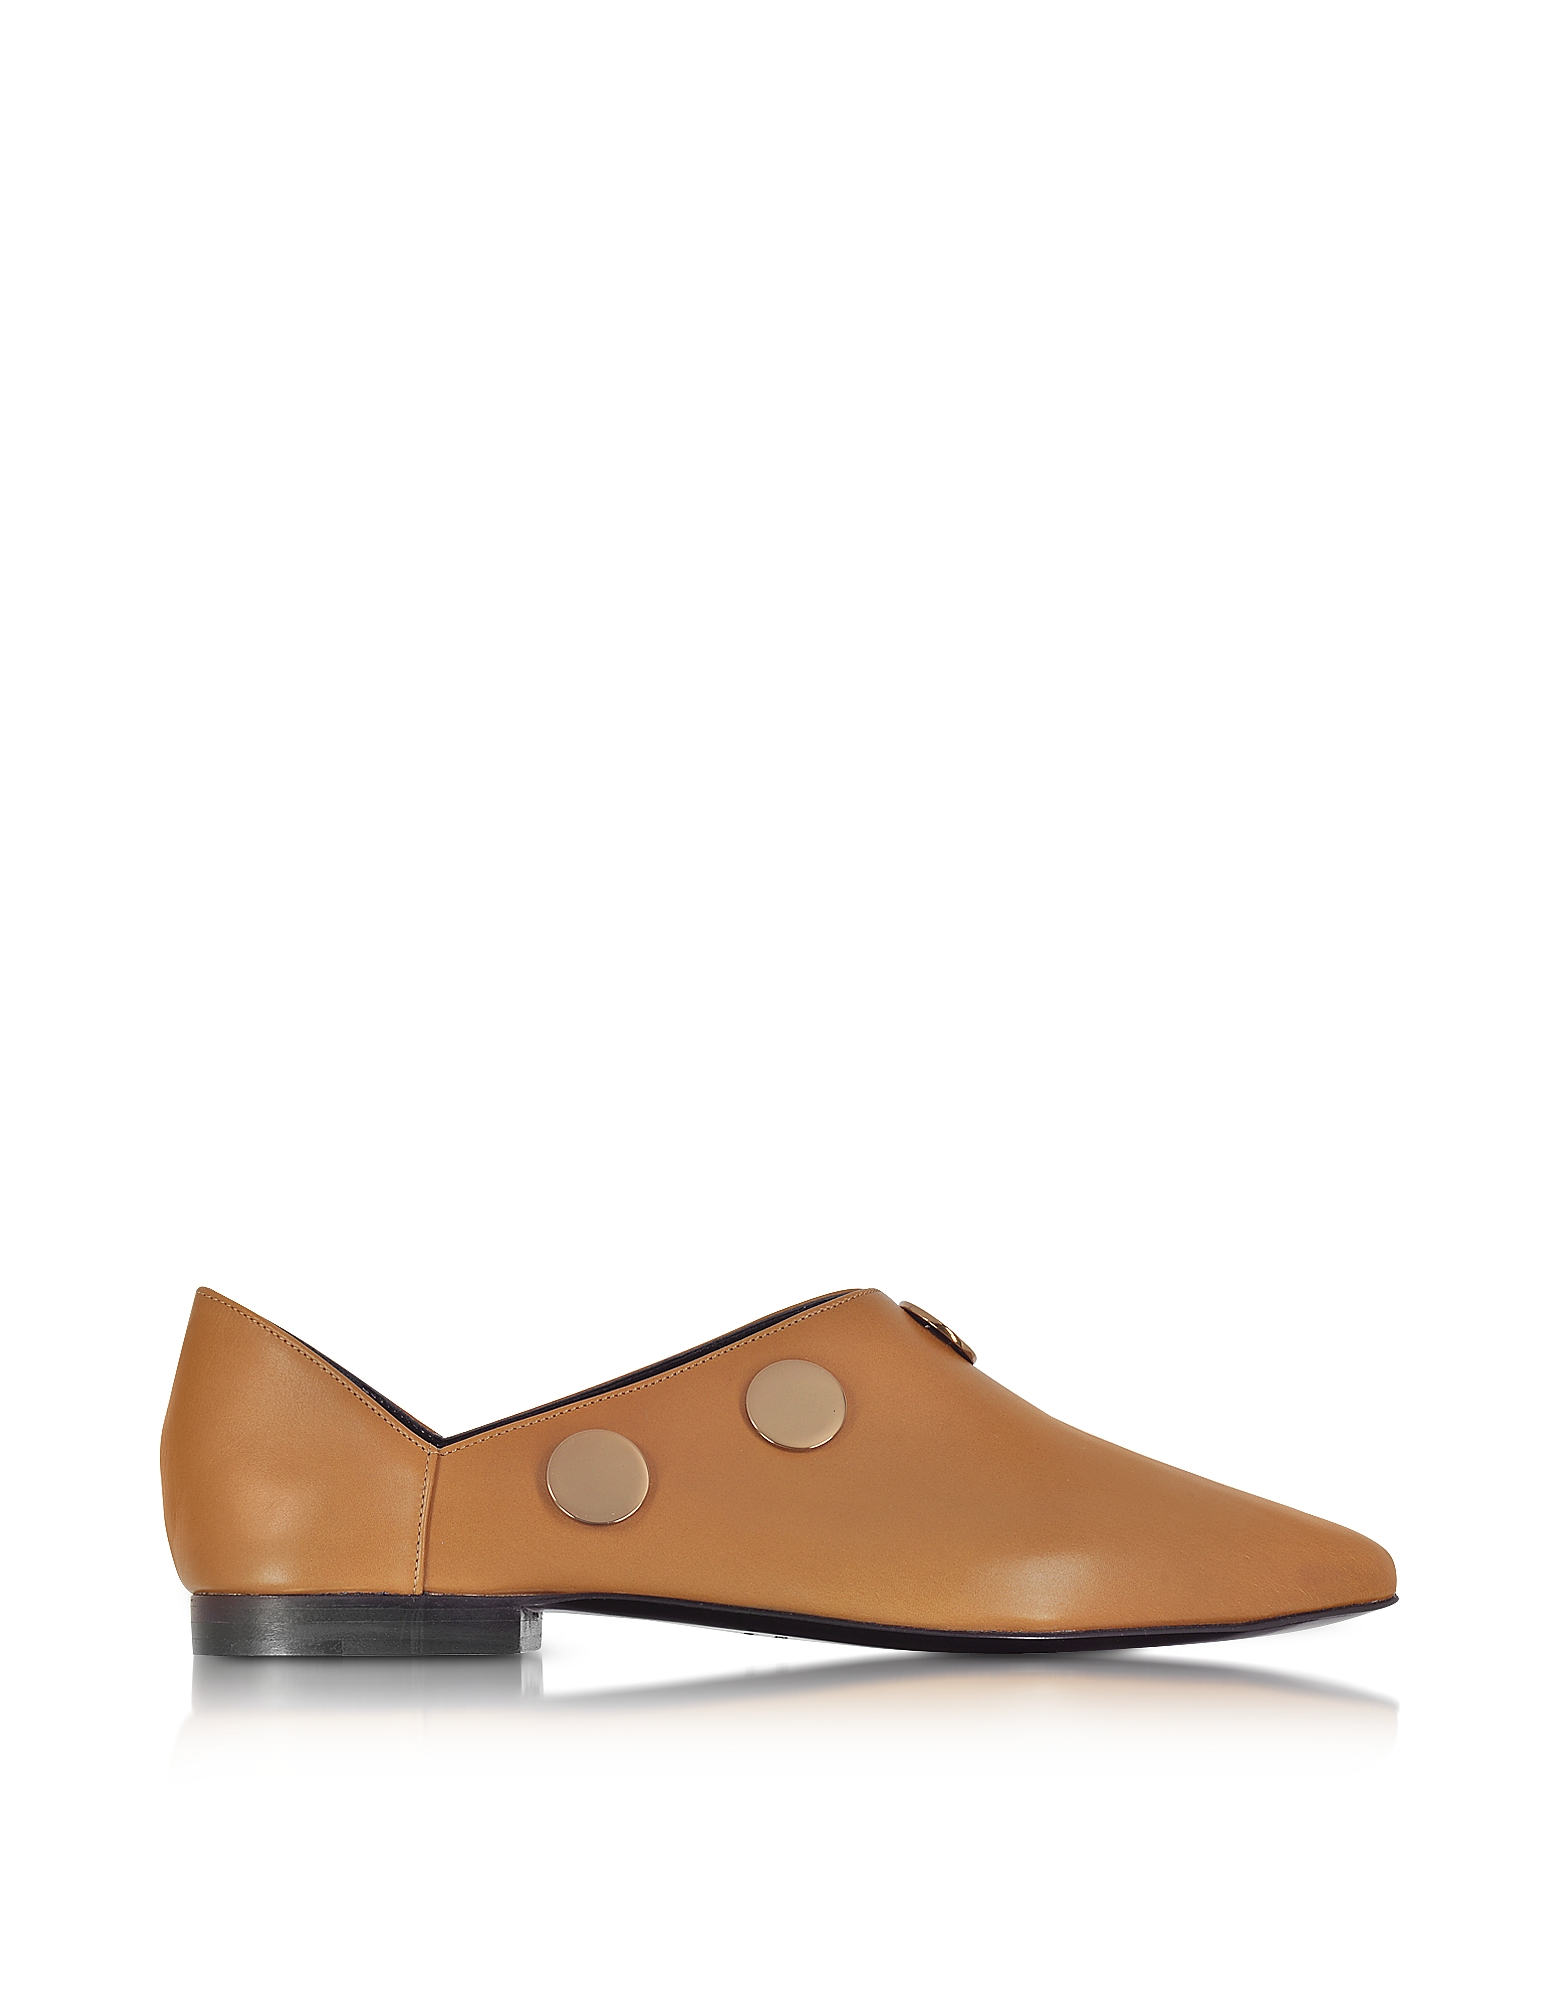 Pierre Hardy Shoes, Camel Leather Penny Mule w/Golden Metal Studs